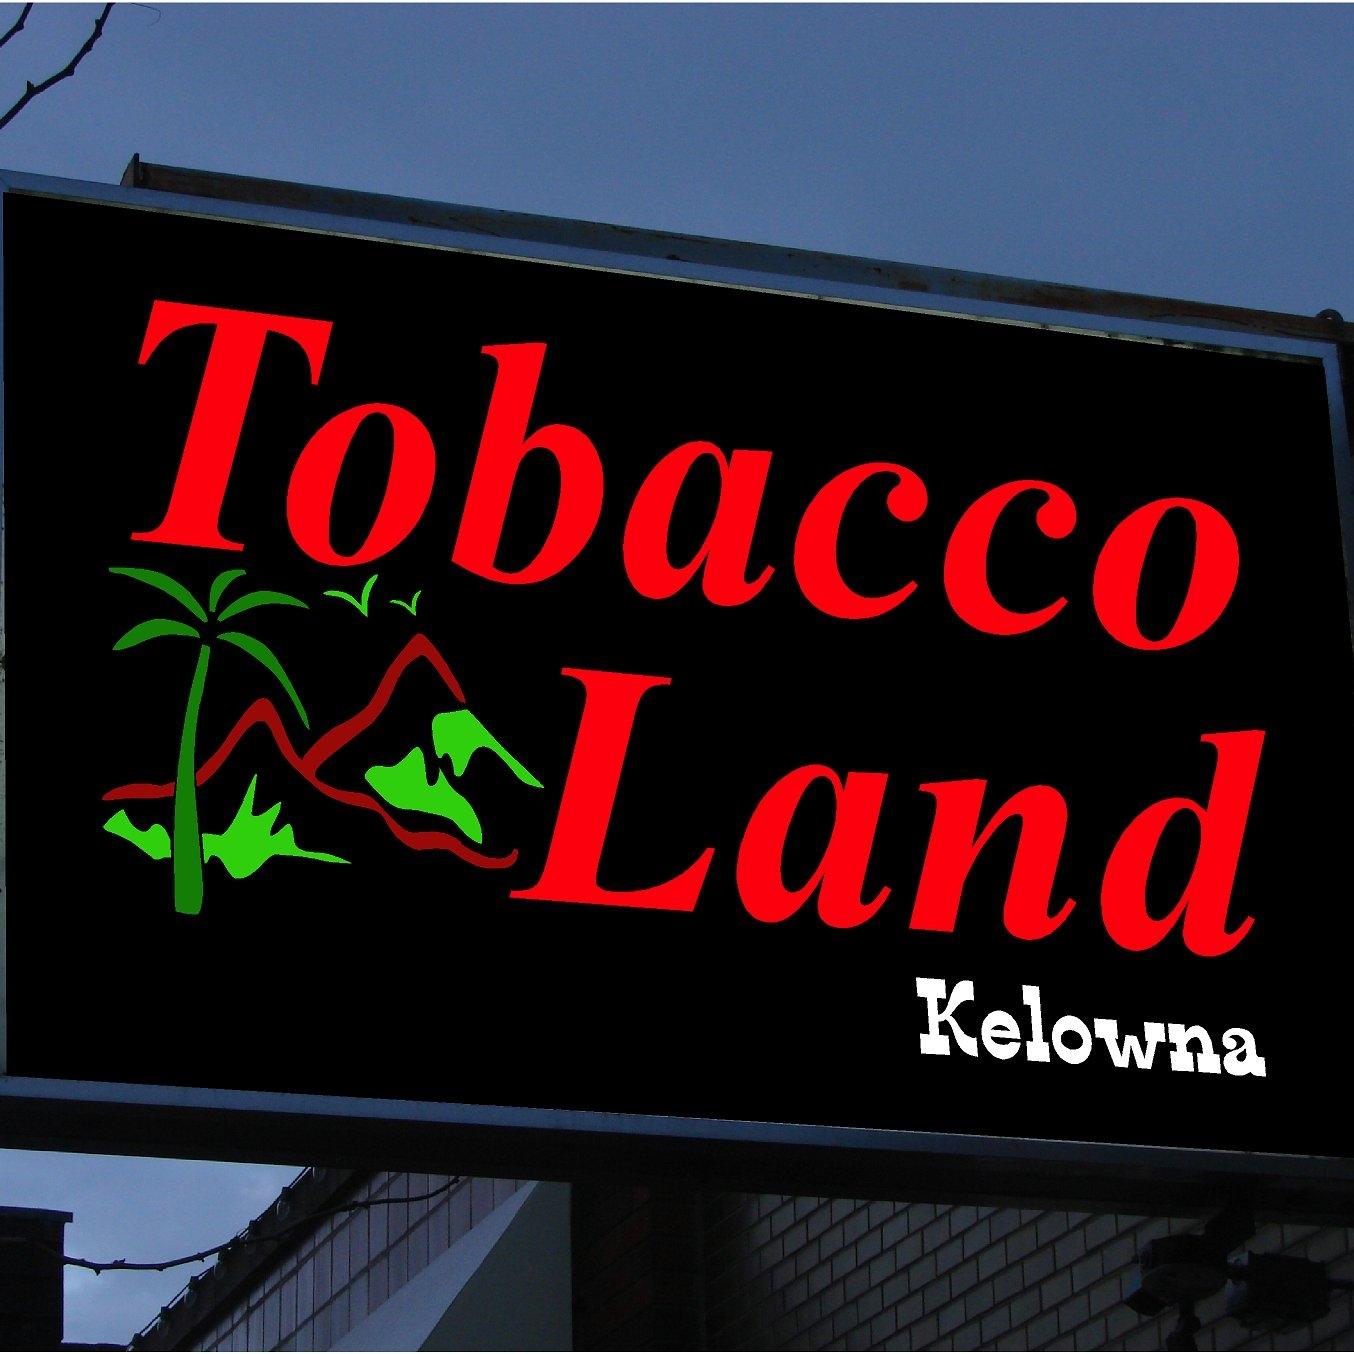 Tobaccoland of Kelowna